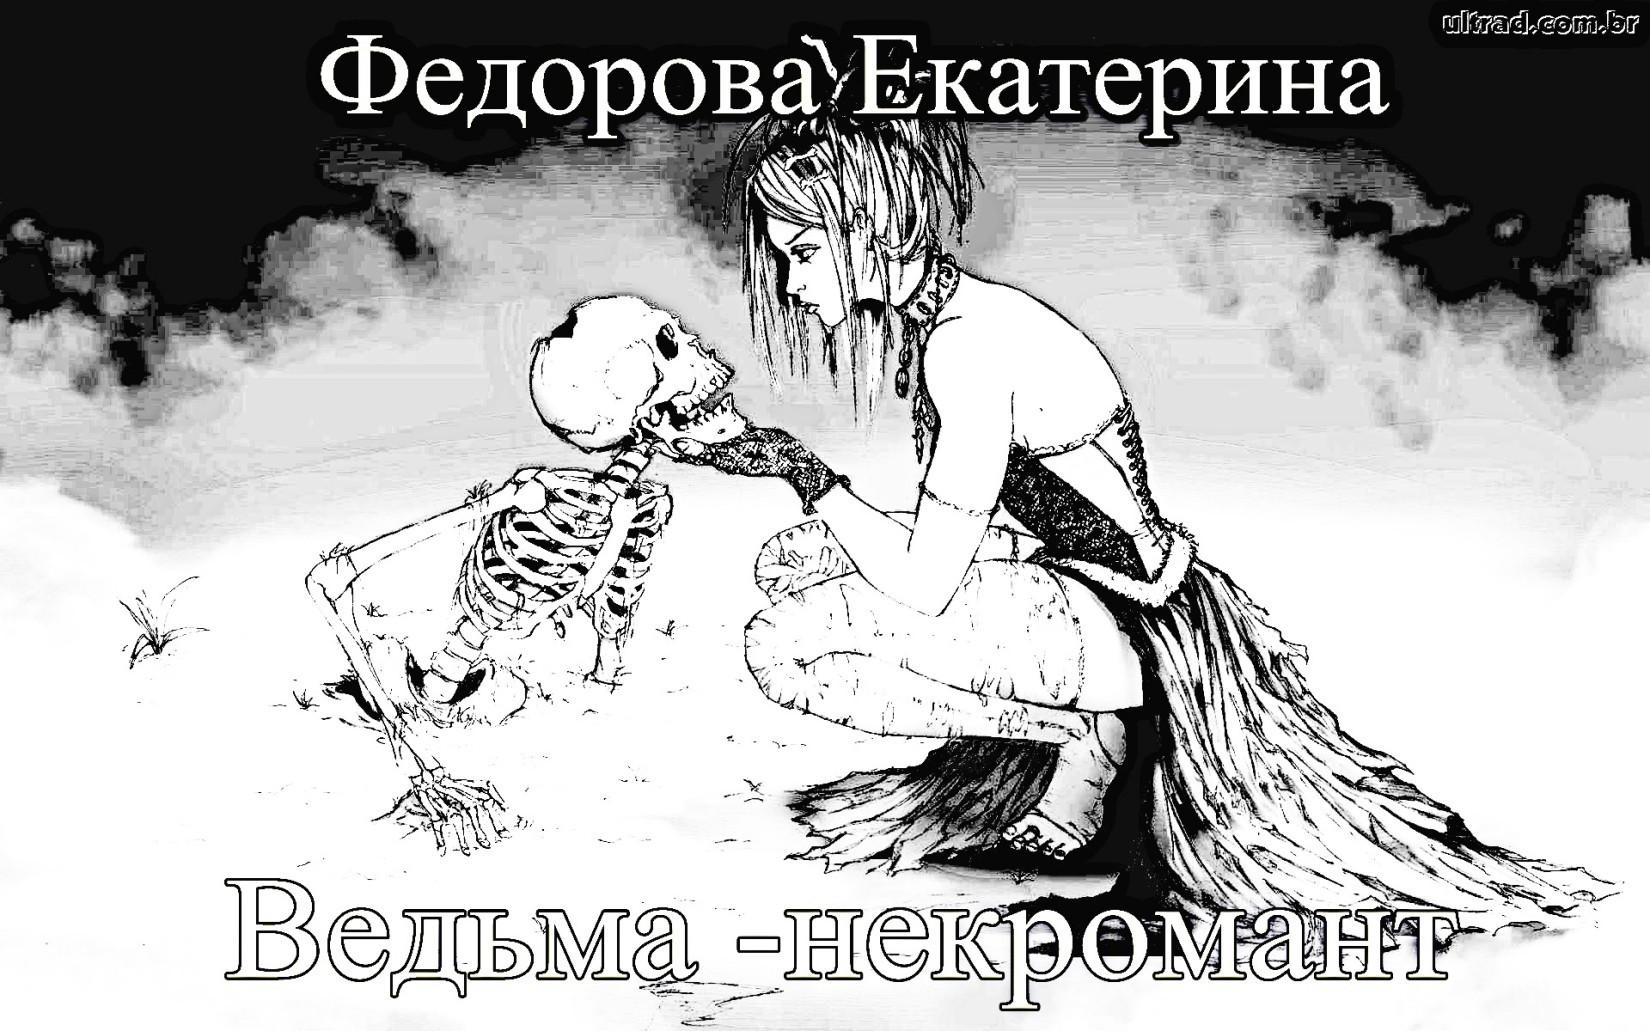 Екатерина Владимировна Федорова Ведьма-некромант глаголева екатерина владимировна луи рено